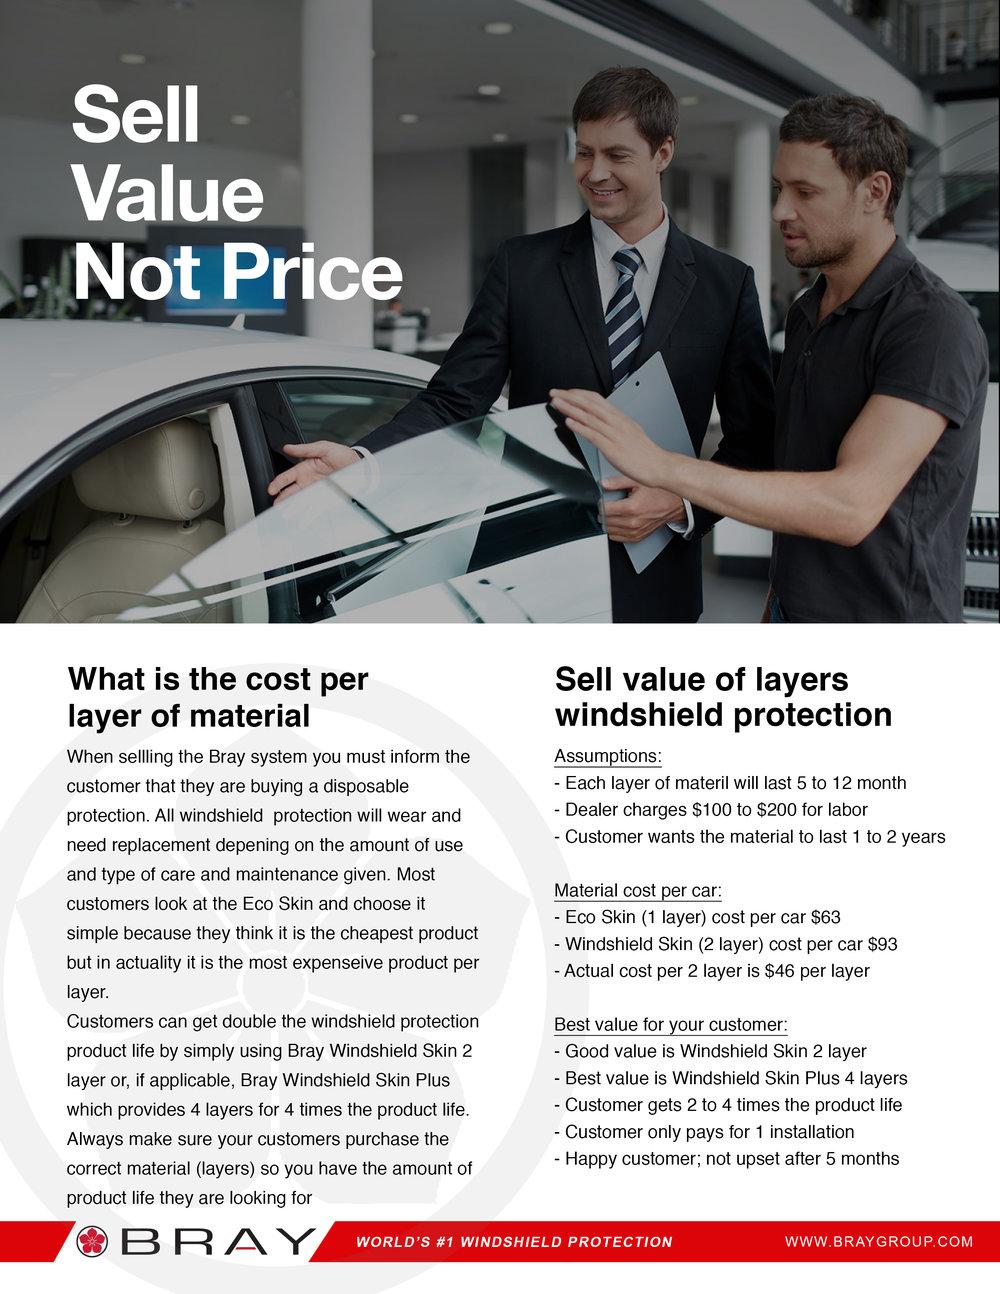 sales_sheet_sale value.jpg